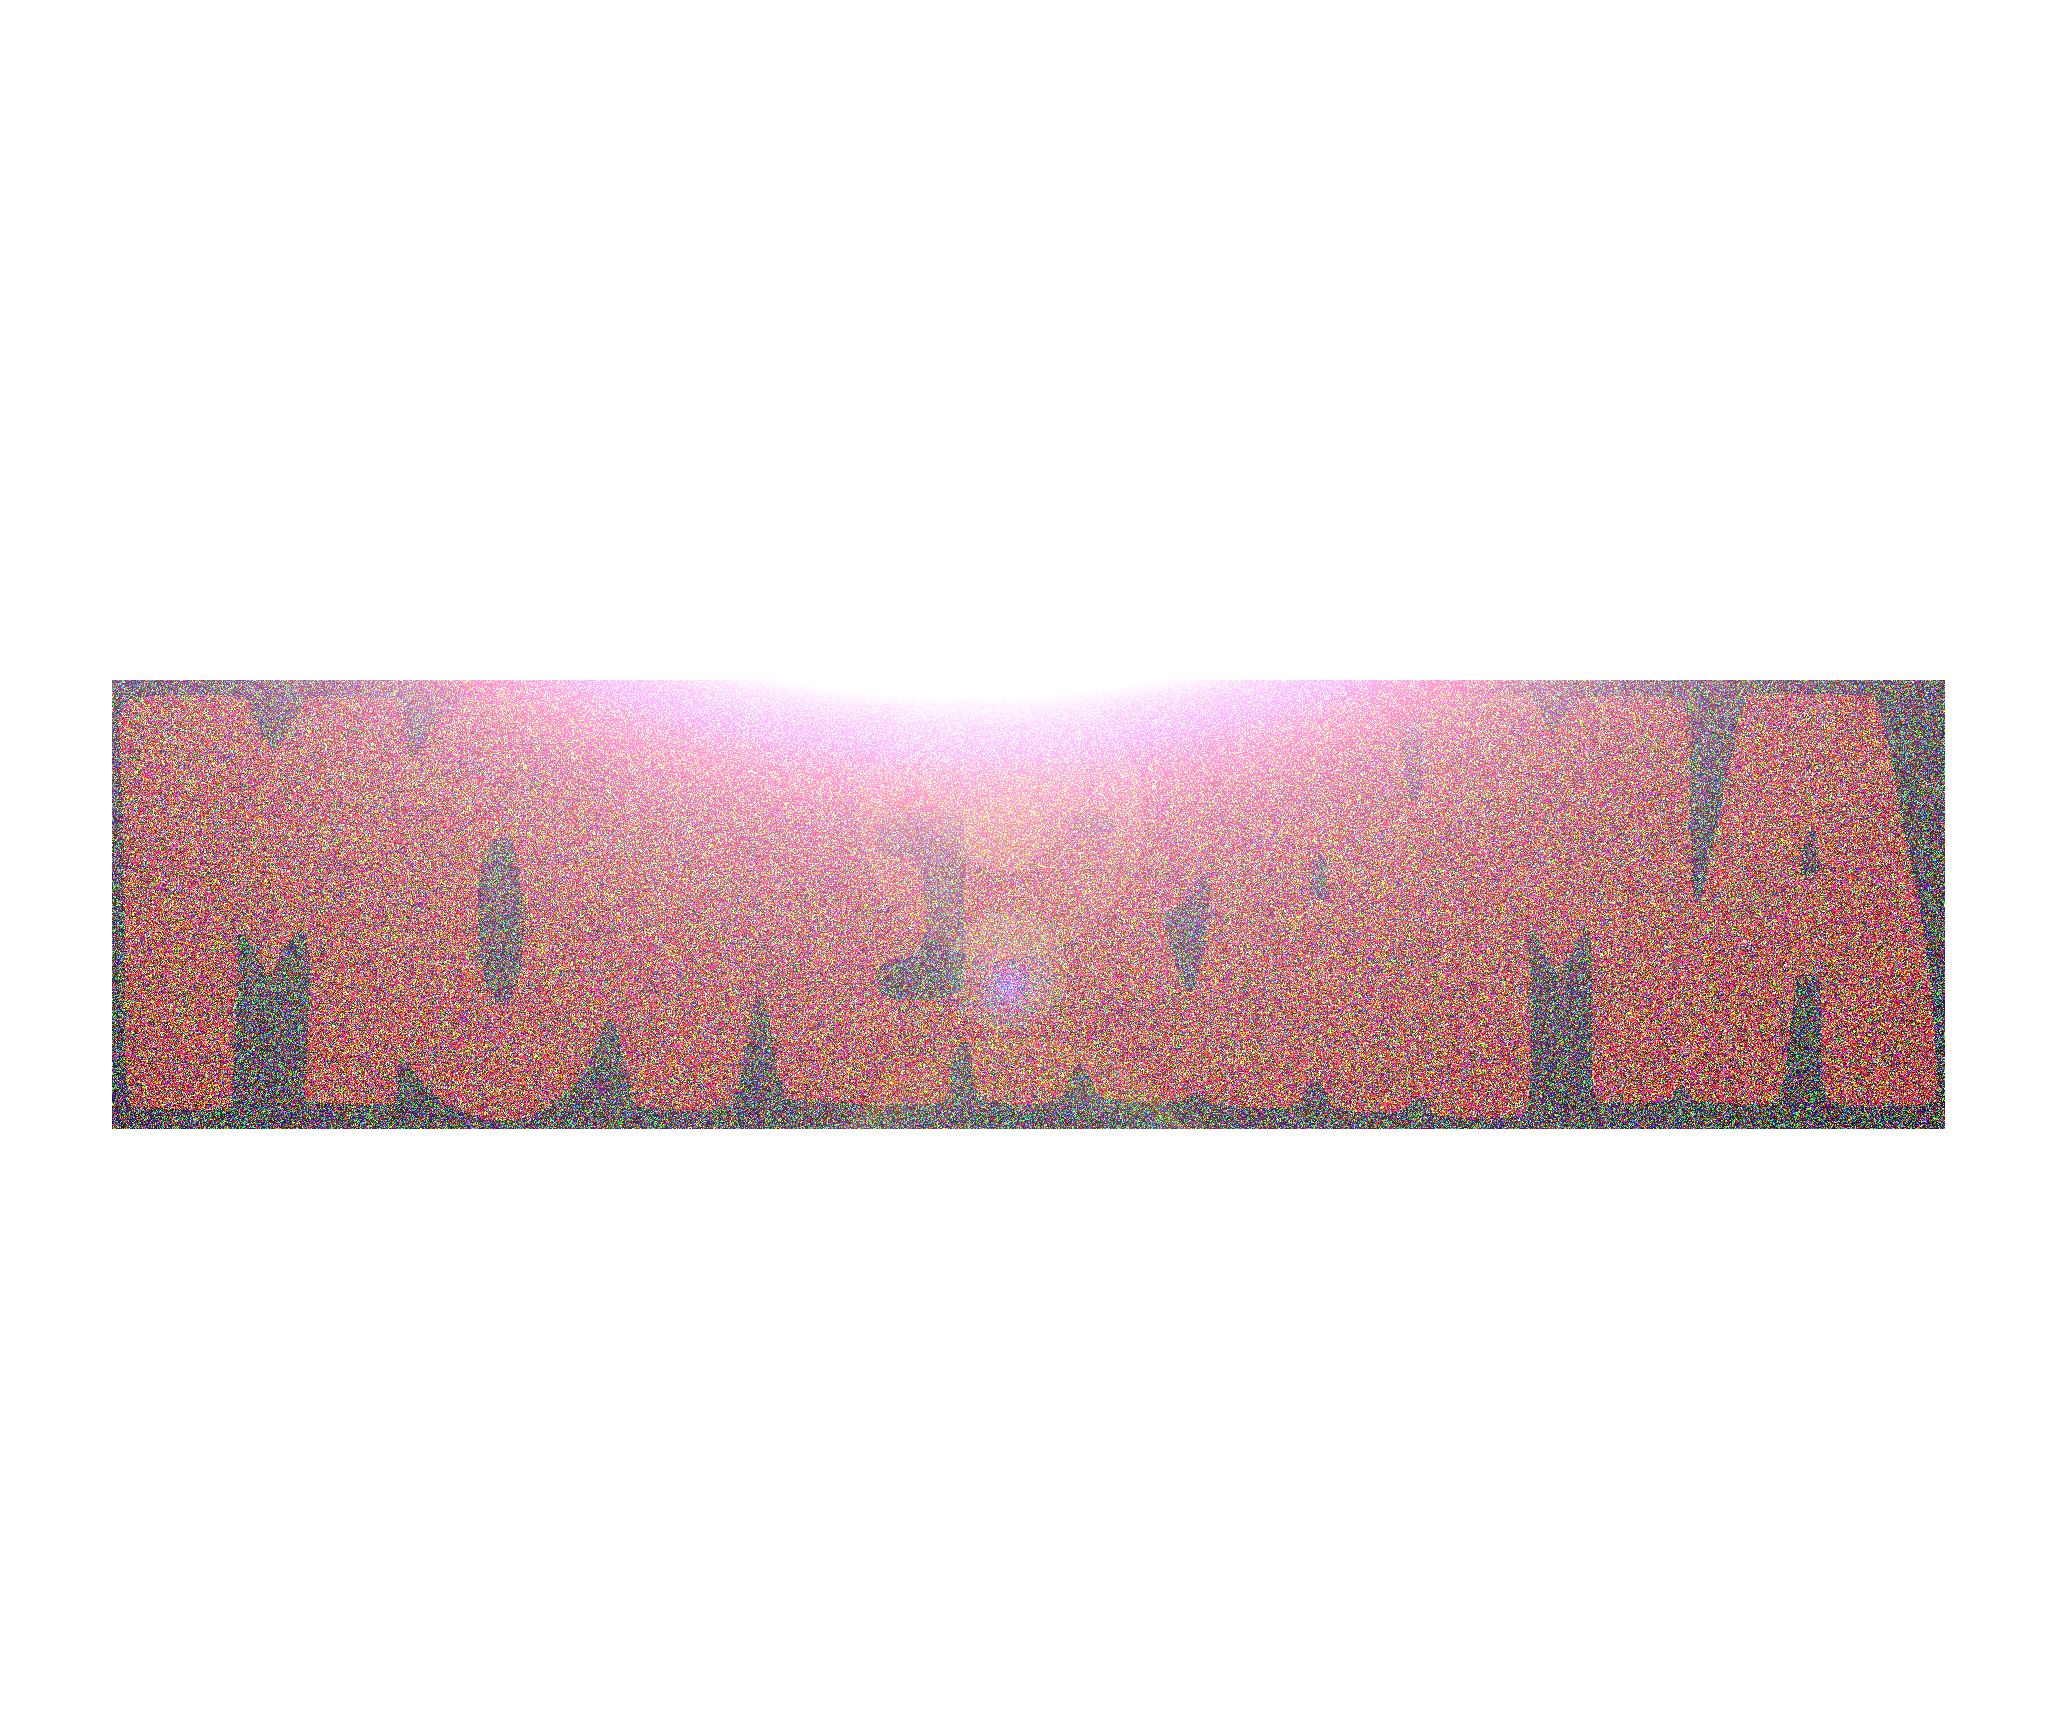 moveramalogogwebsite.png